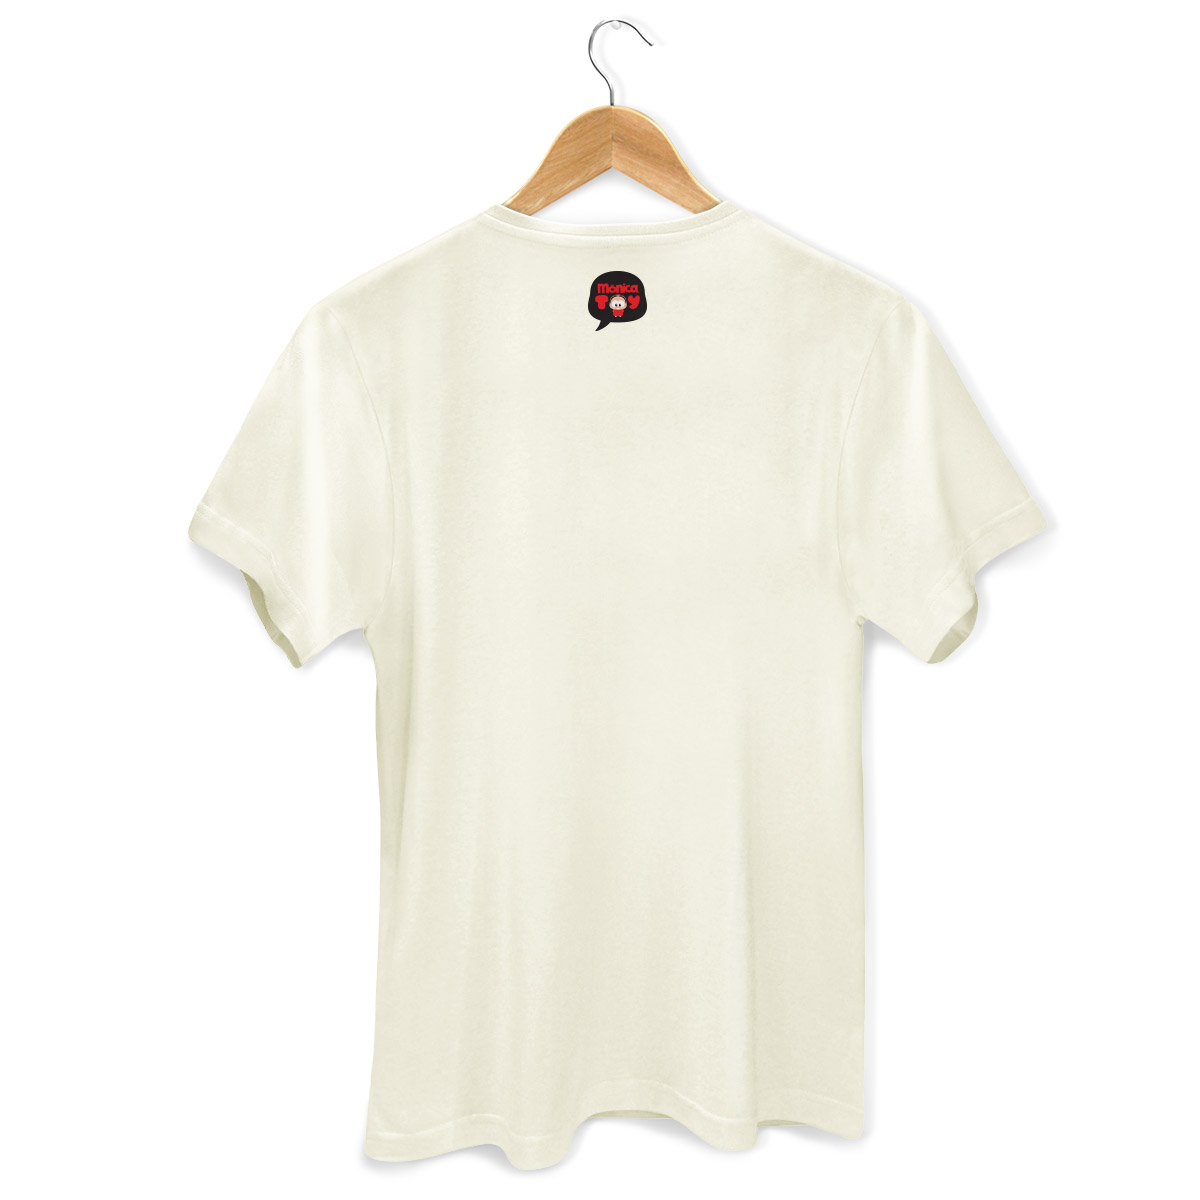 Camiseta Masculina Turma da Mônica Toy Angry Mônica